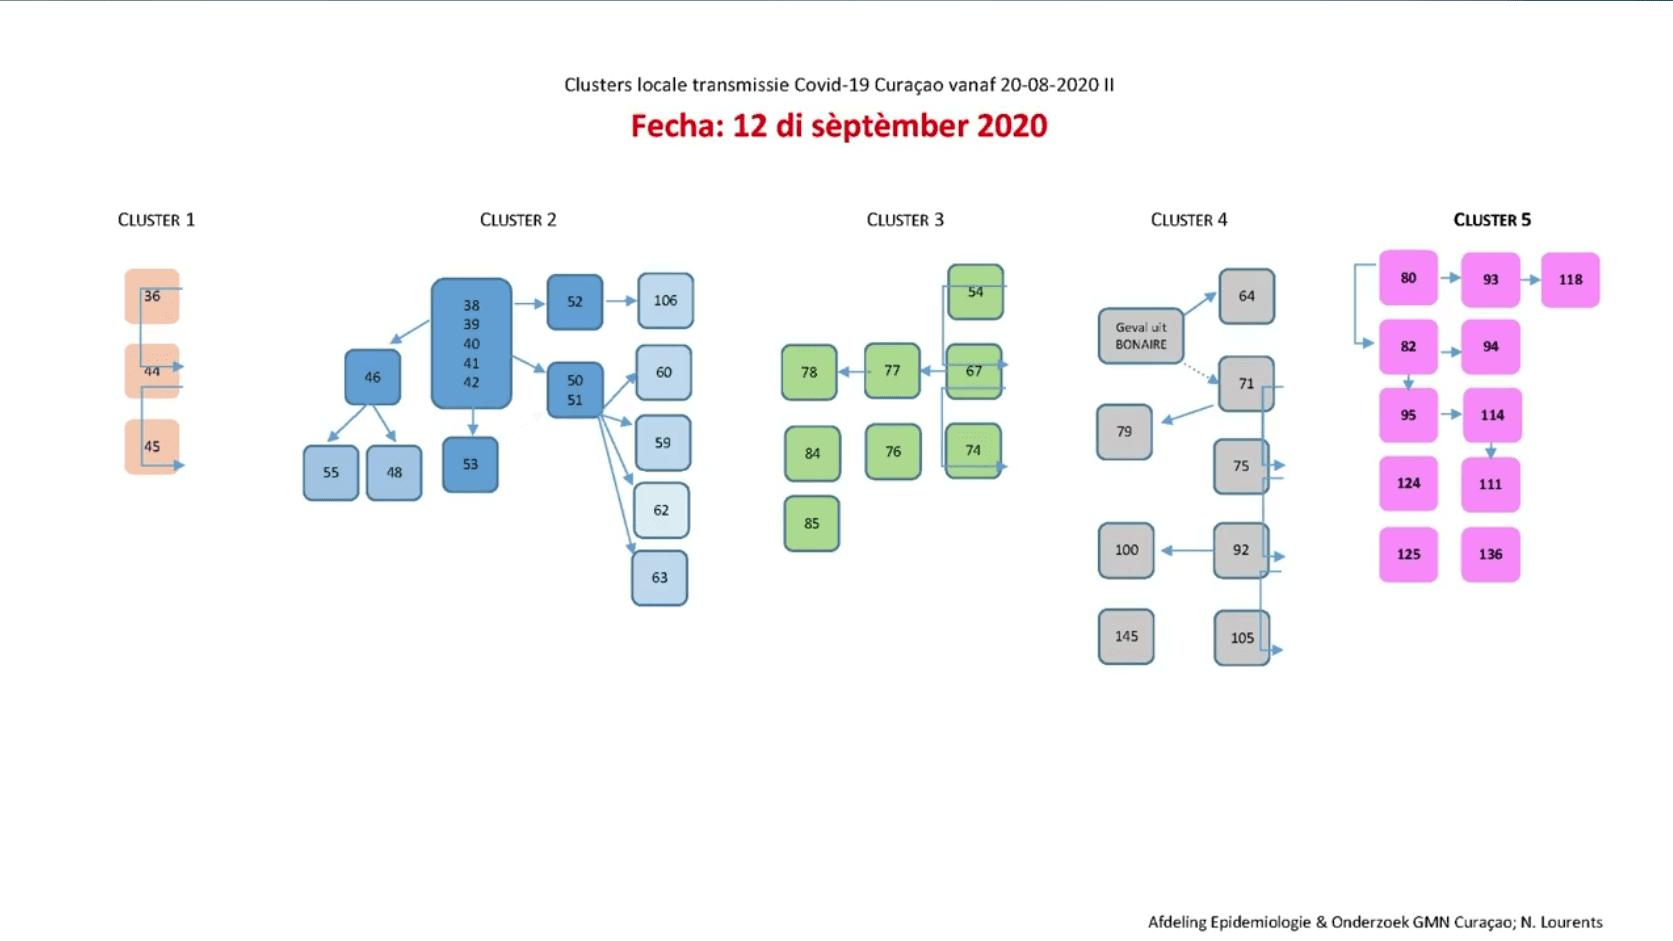 corona clusters curacao (deel 1)